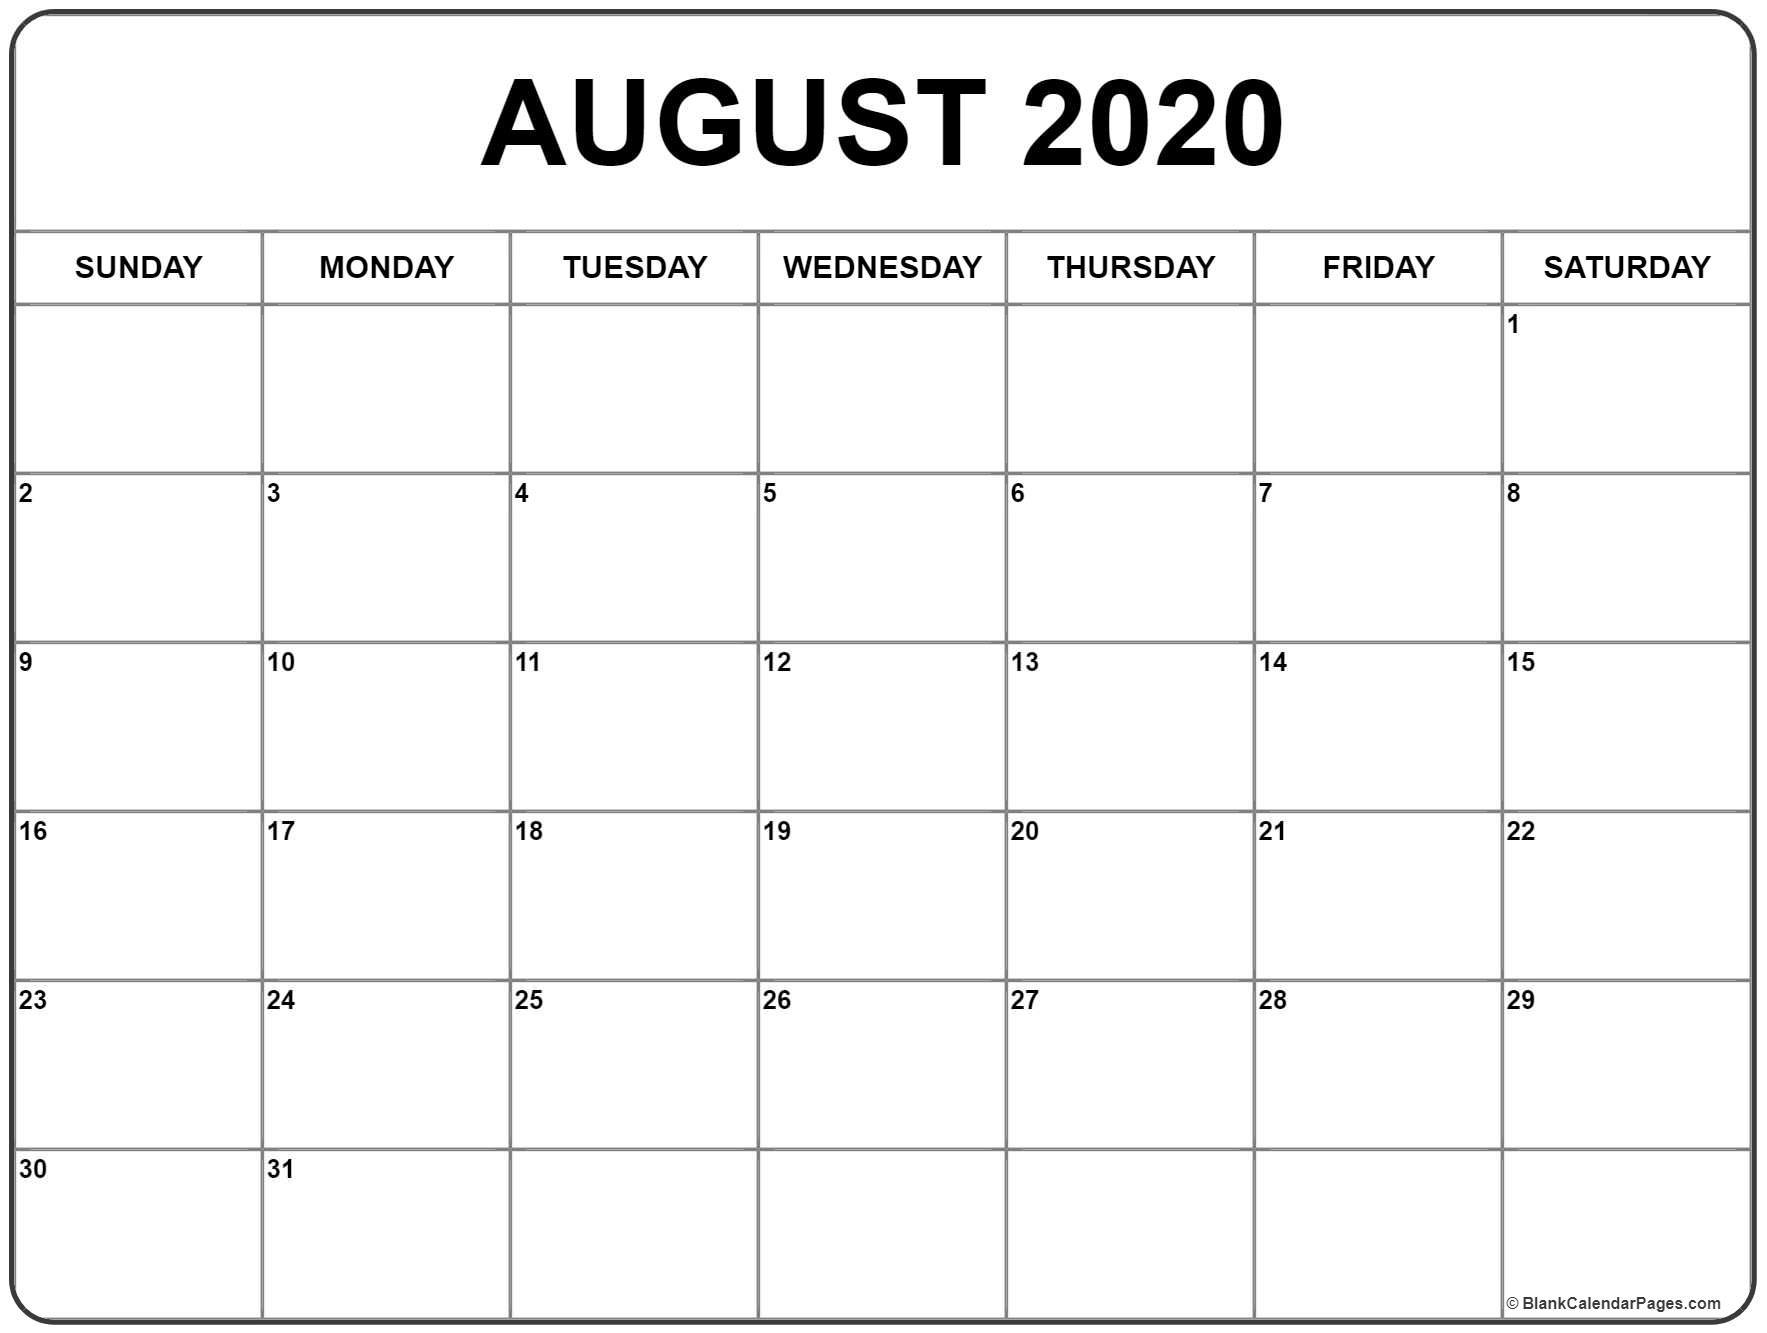 August 2020 Calendar | Free Printable Monthly Calendars_Blank Calendar August 2020